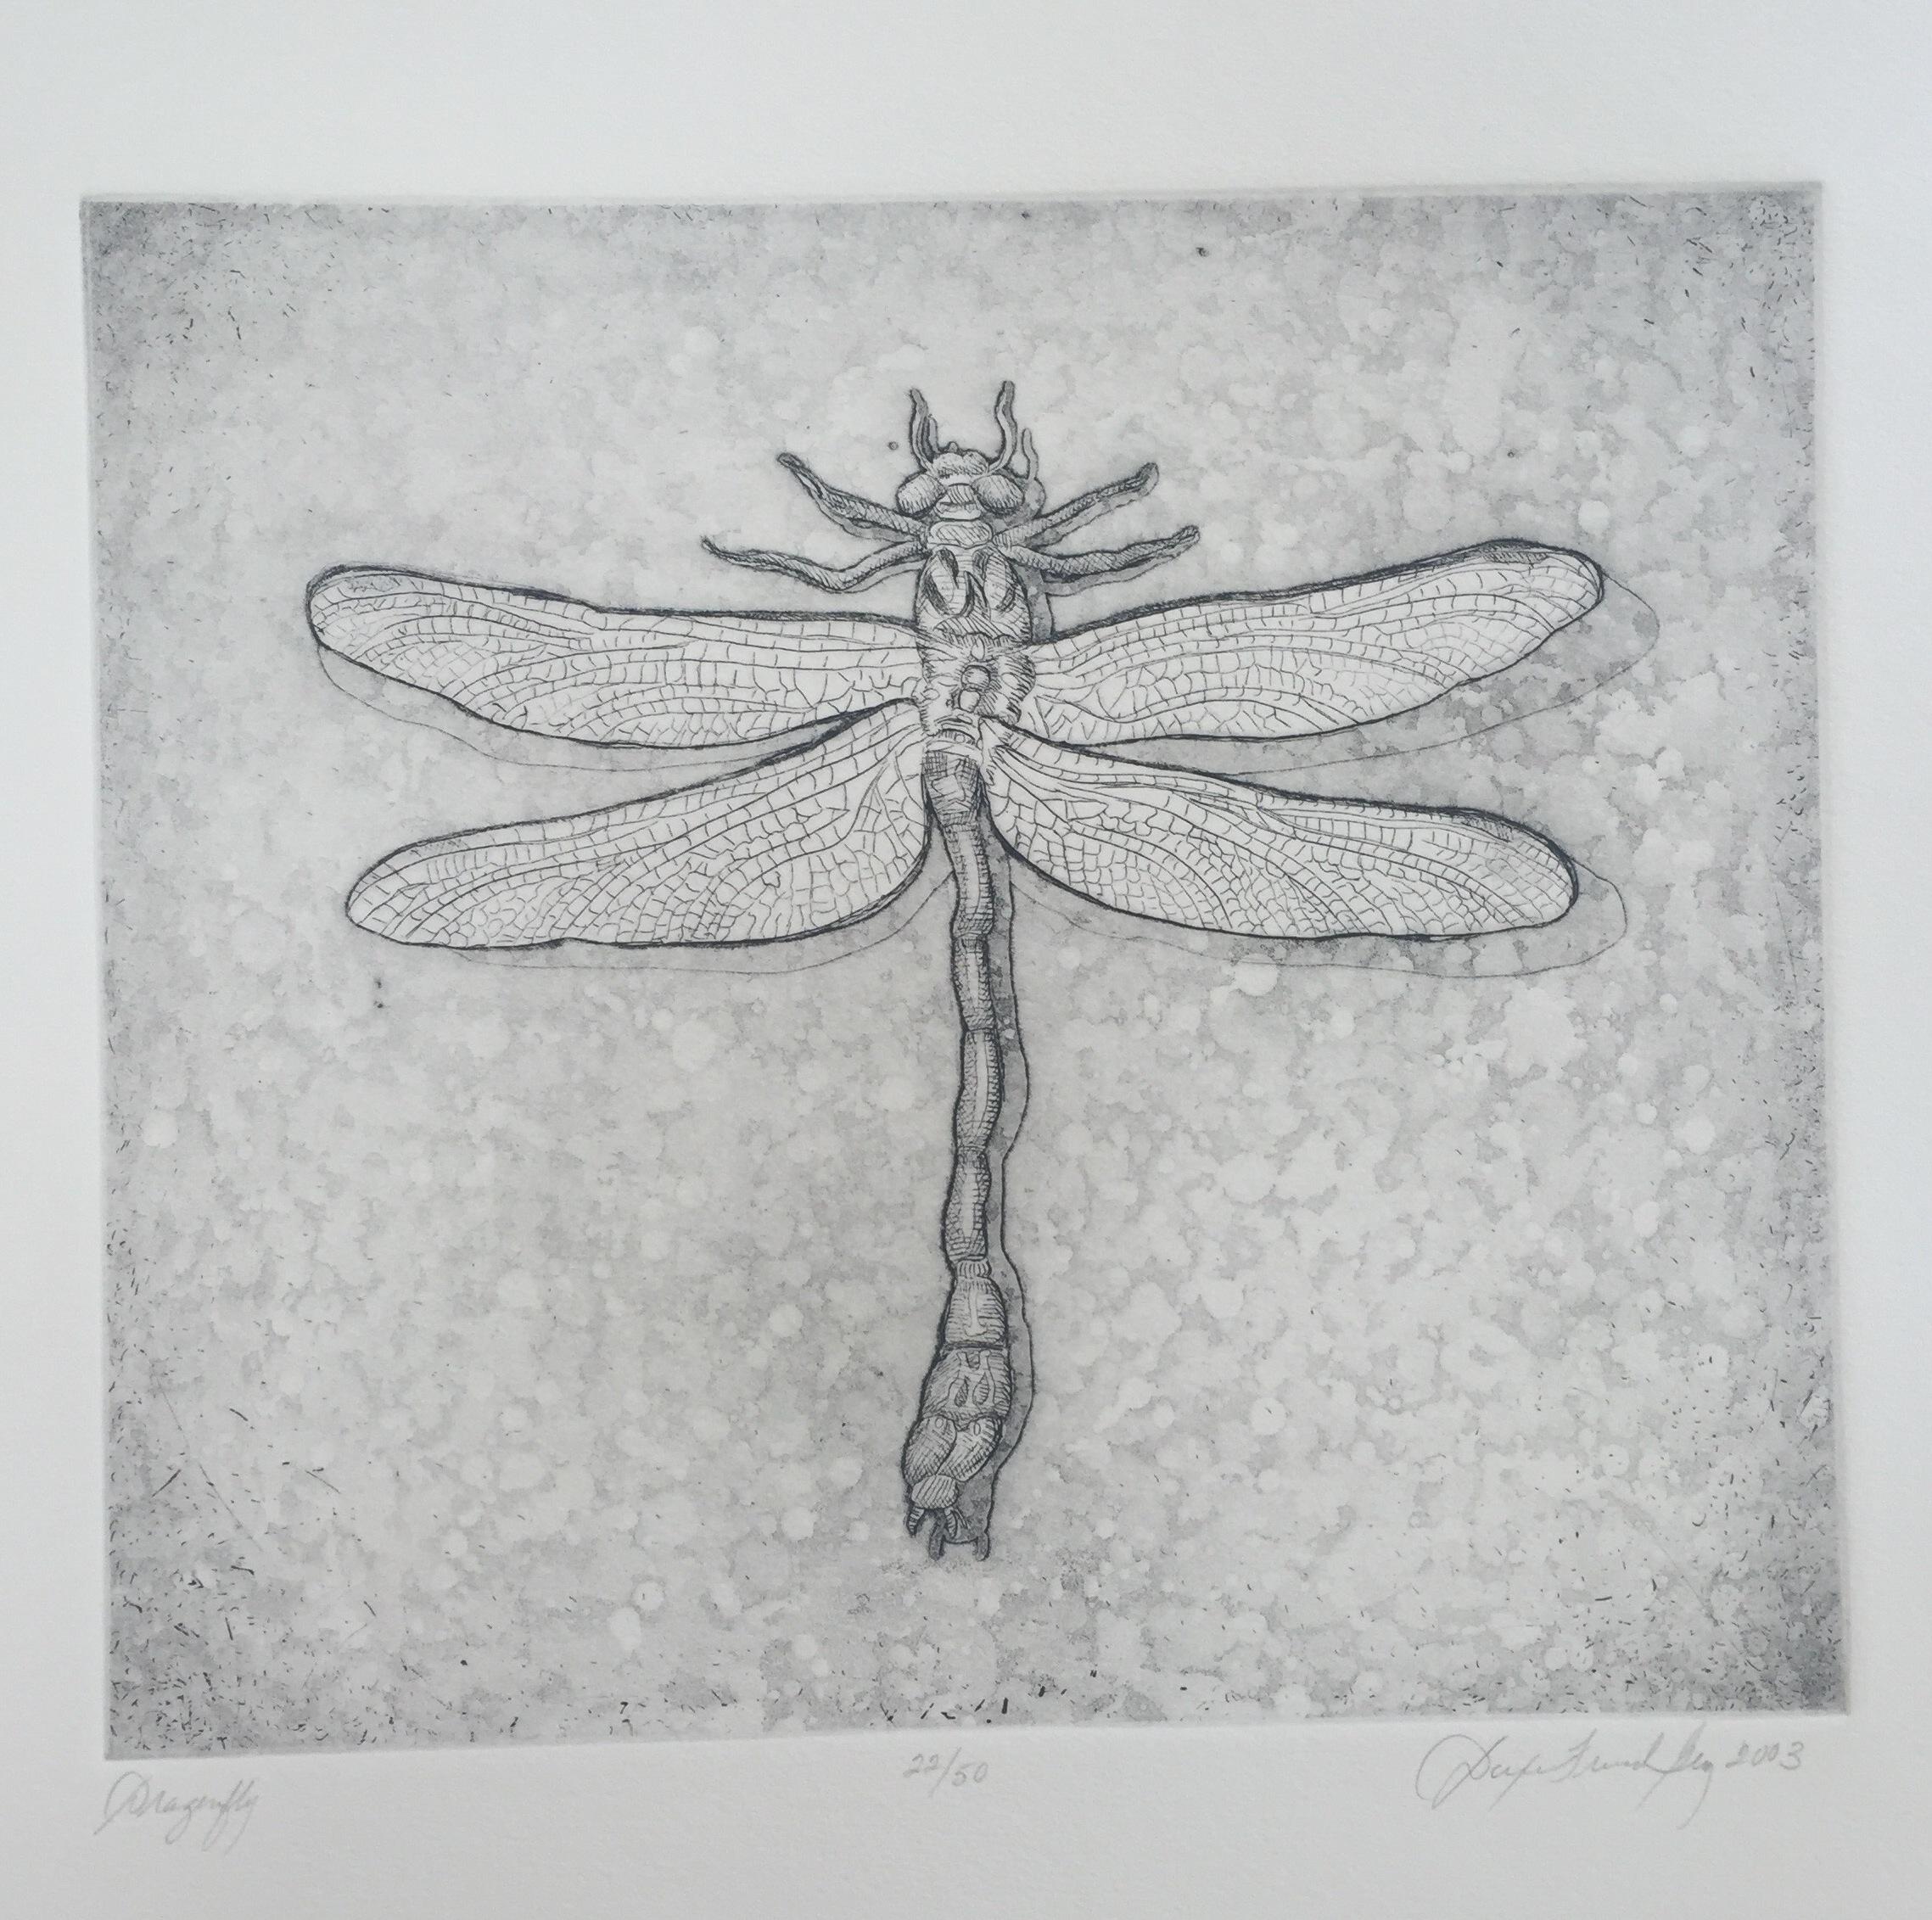 Dragonfly, 2003